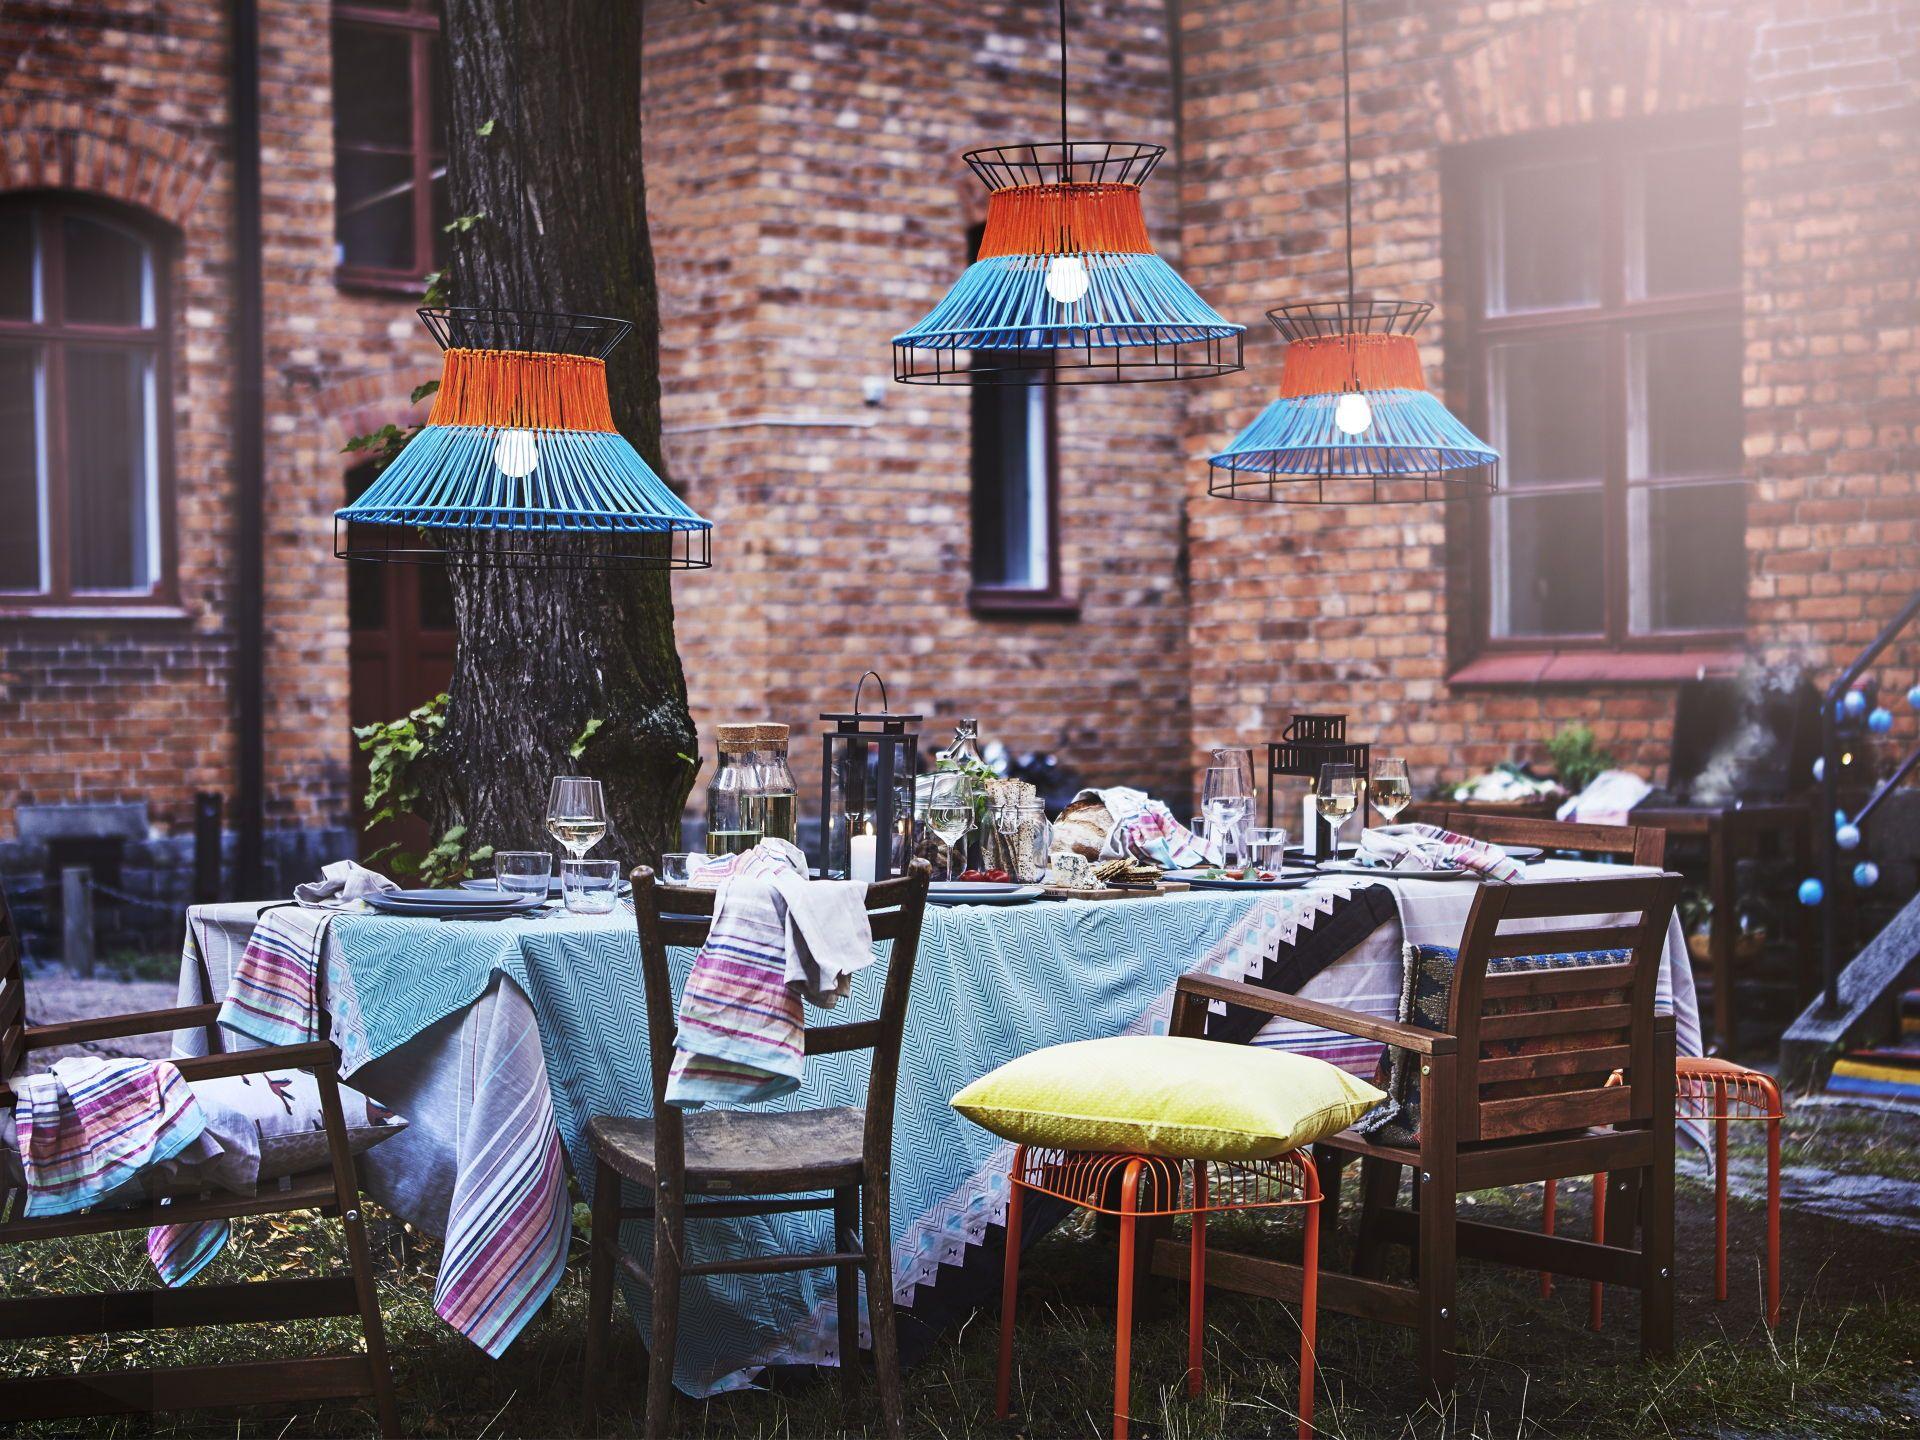 Zomer Interieur Inspiratie : Solvinden led plafondlamp oranje blauw buiten evenings outside